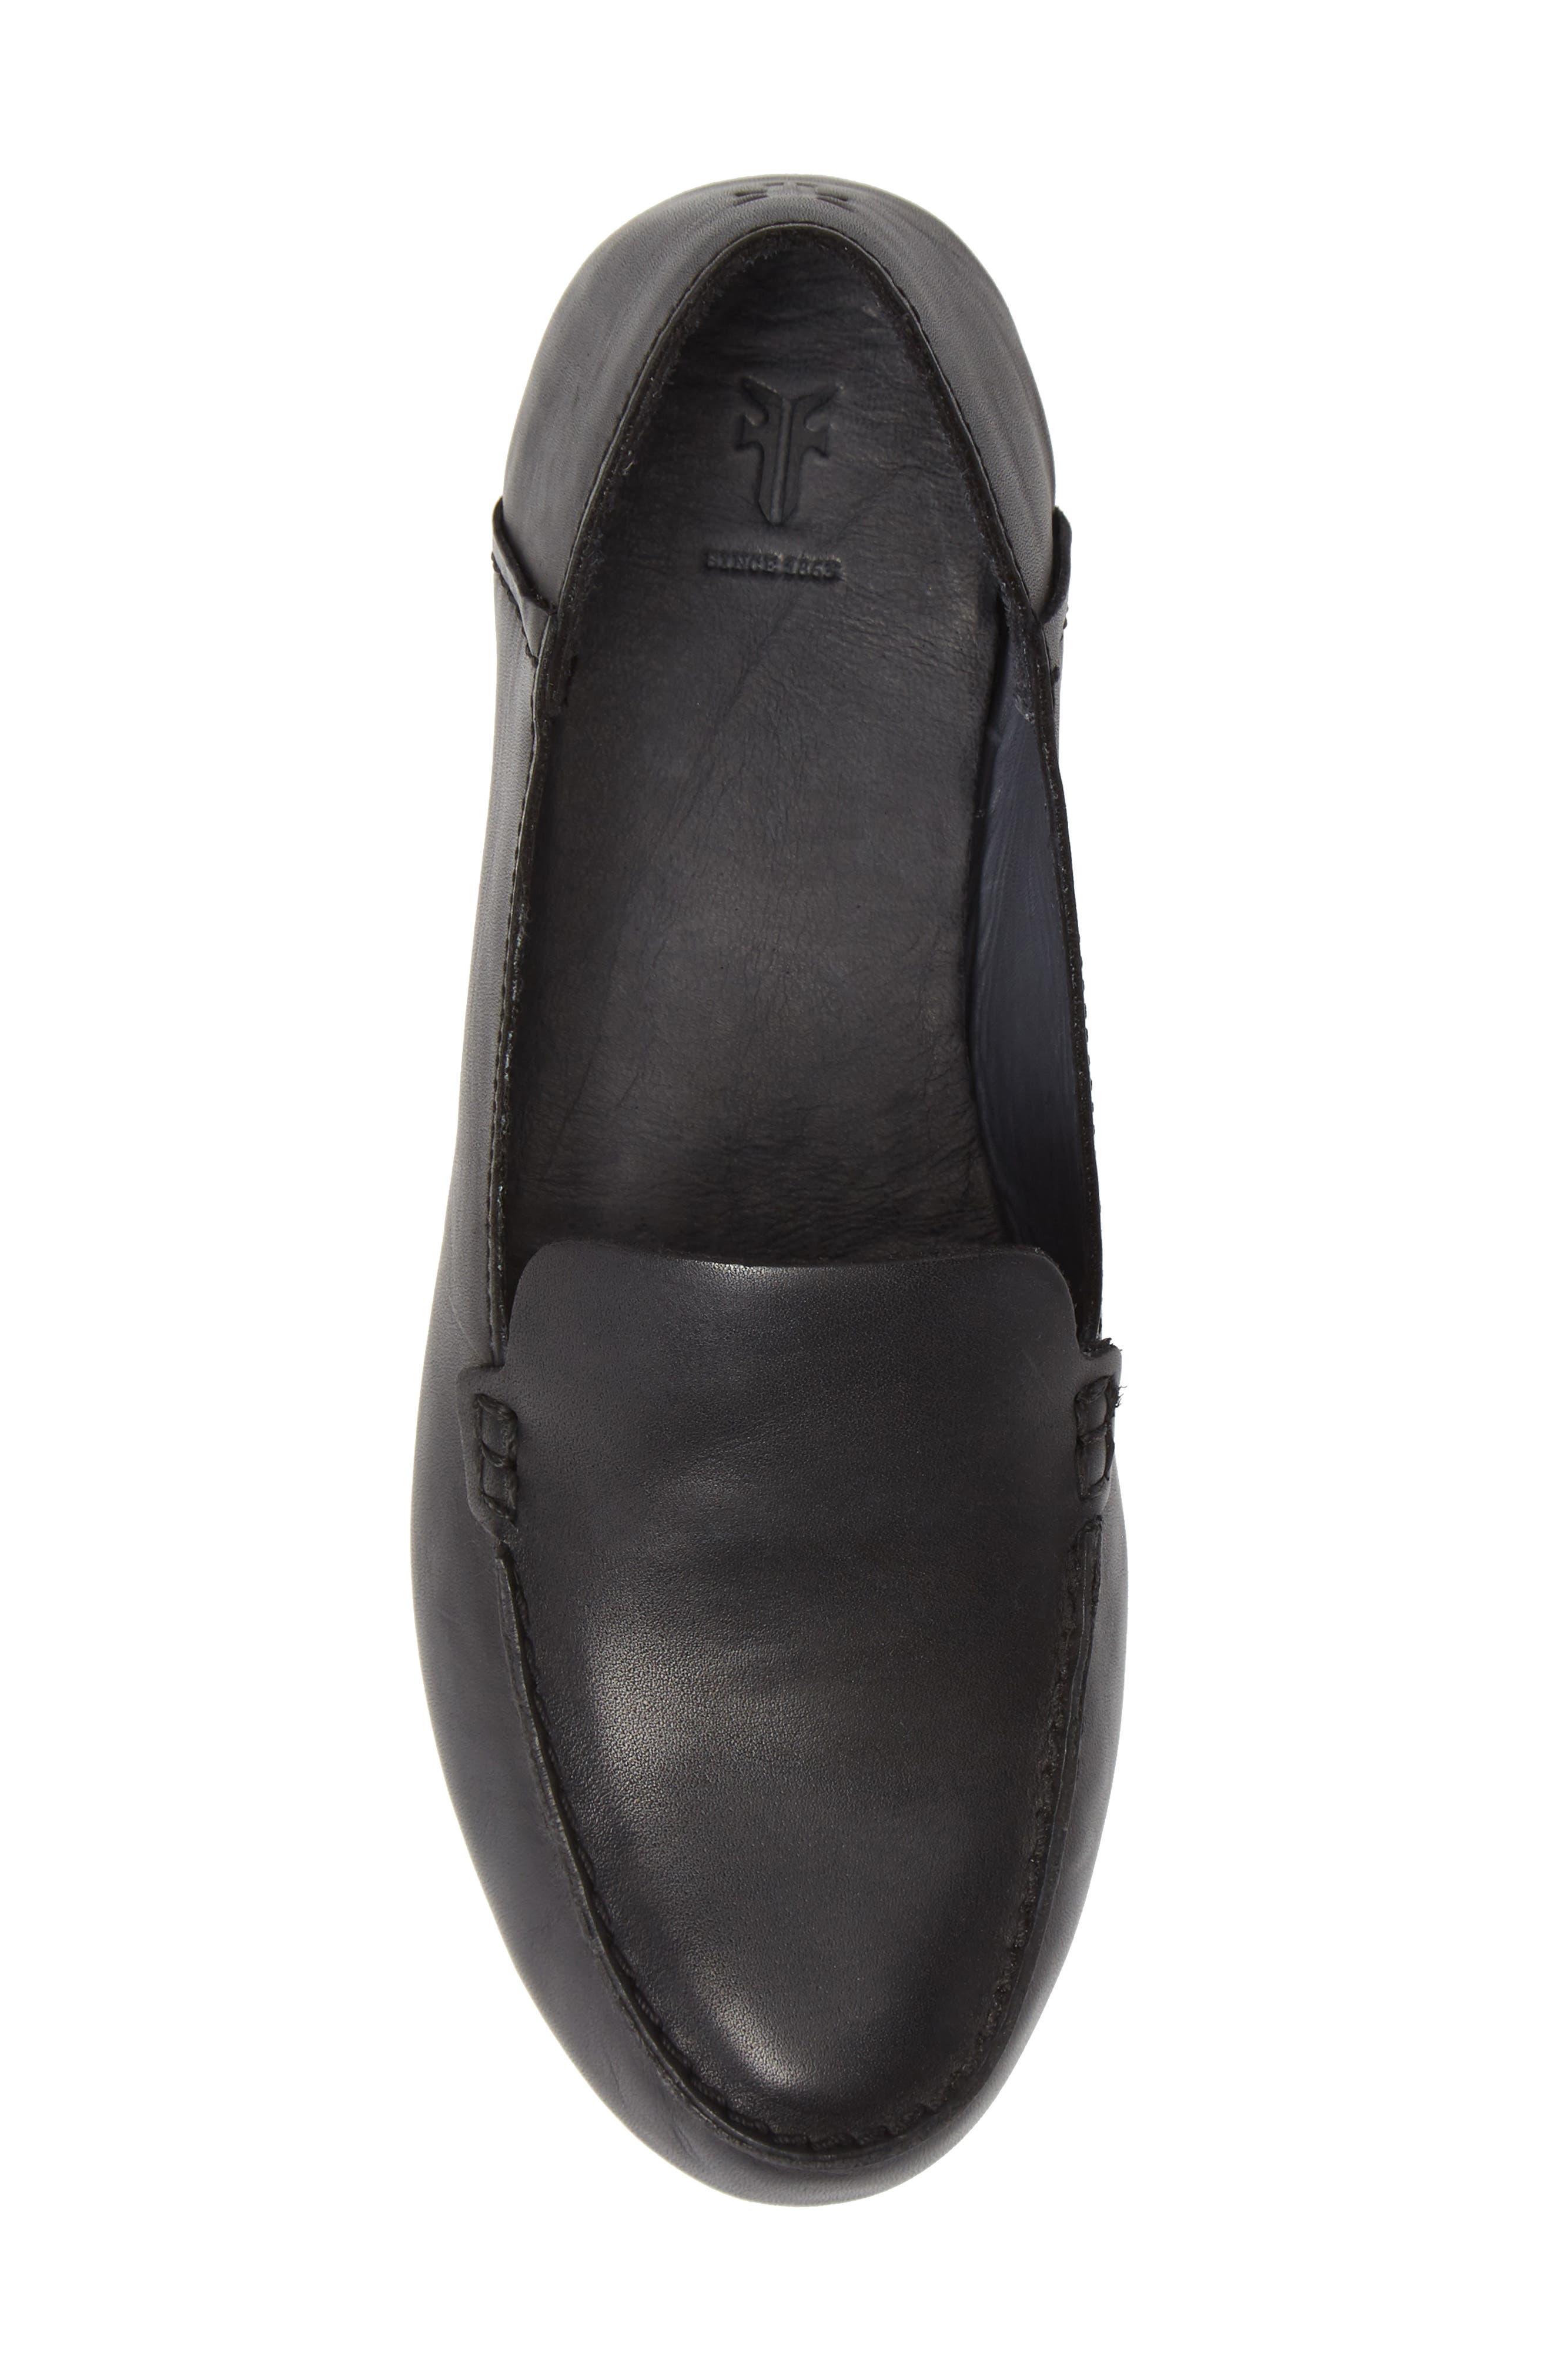 Sedona Venetian Loafer,                             Alternate thumbnail 5, color,                             BLACK LEATHER